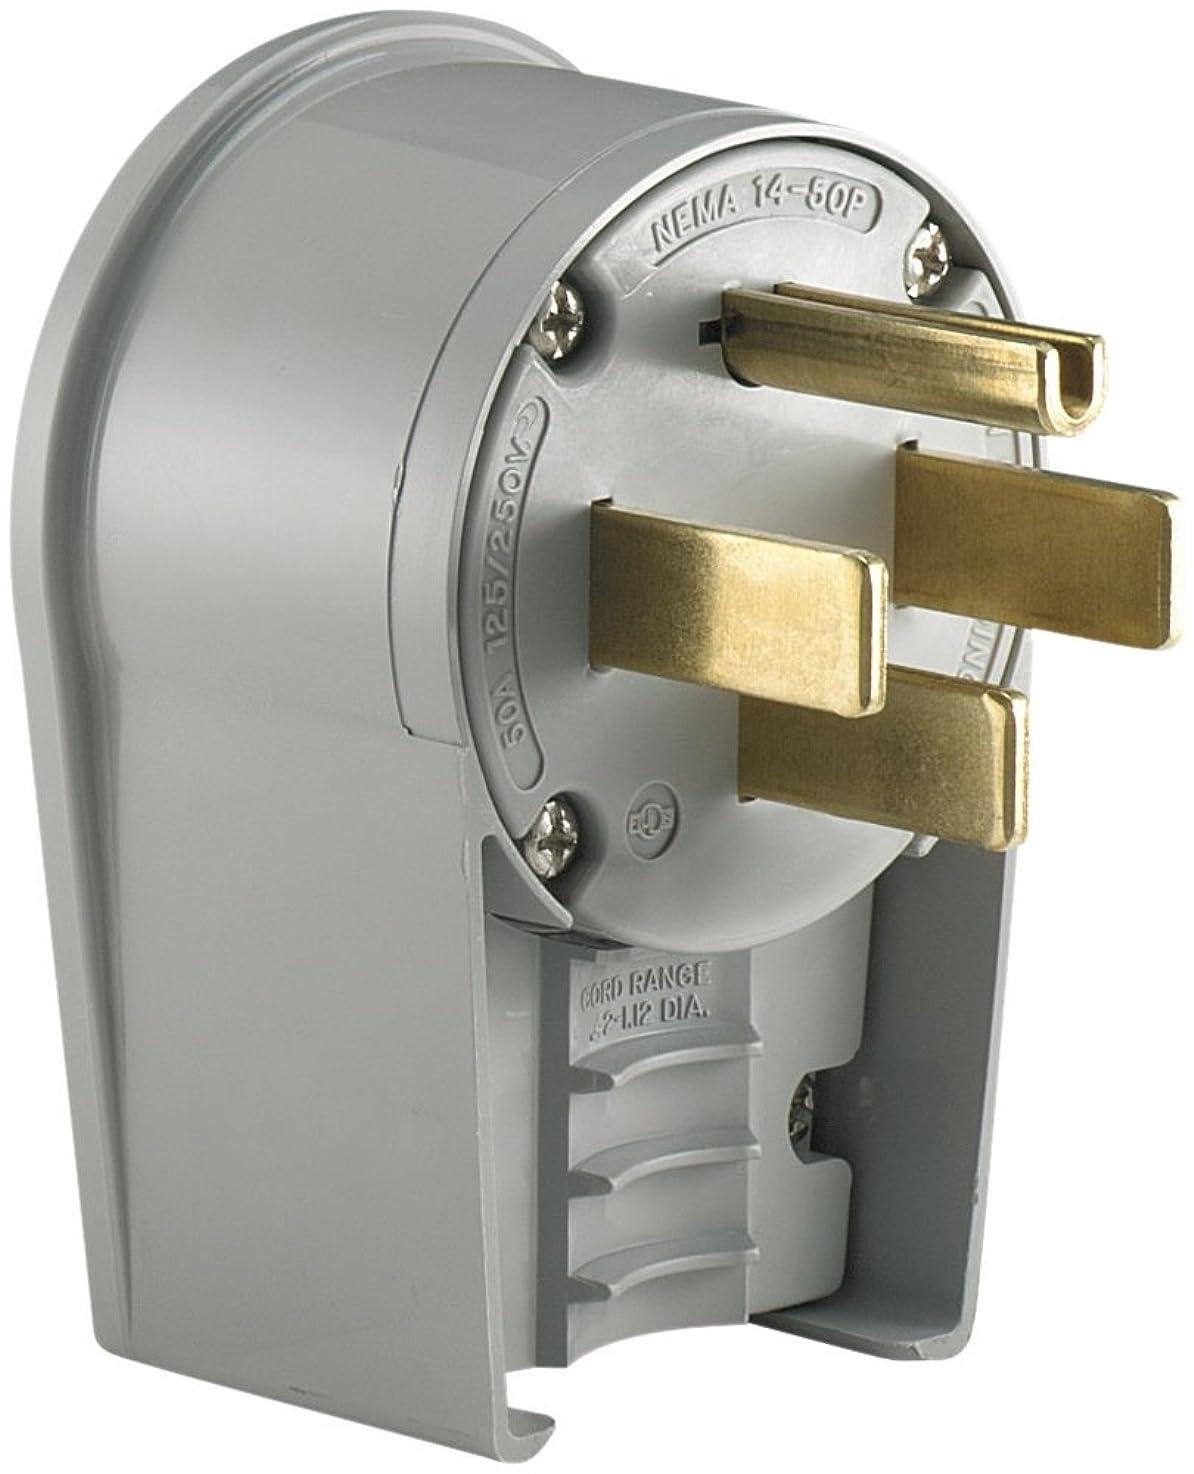 Eaton 5752AN 50 Amp 125/250V 14-50 Industrial Power Plug, Gray